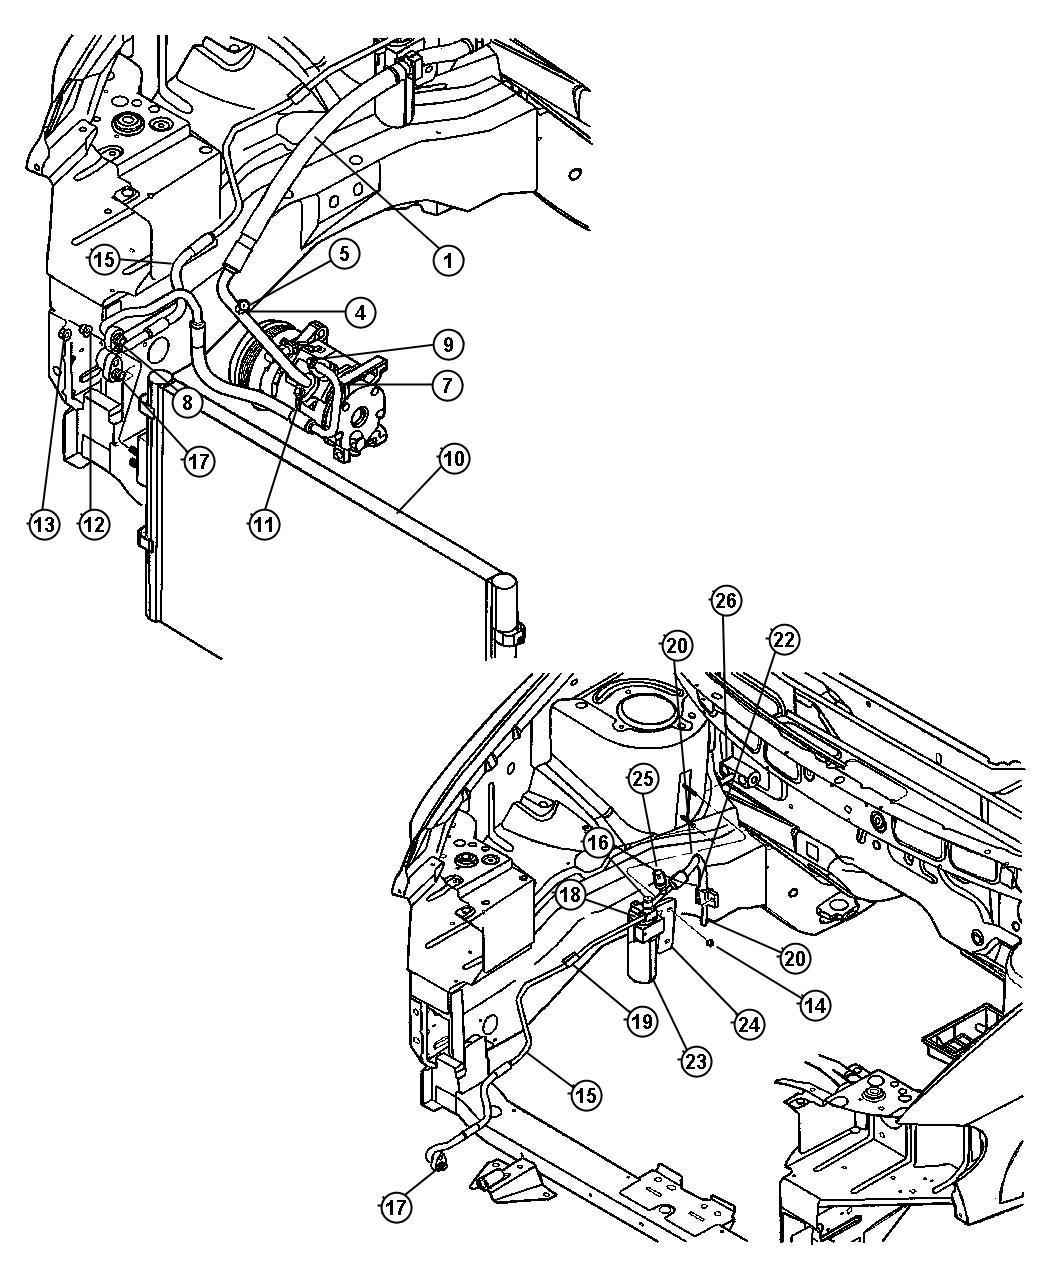 Dodge Grand Caravan Condenser Air Conditioning